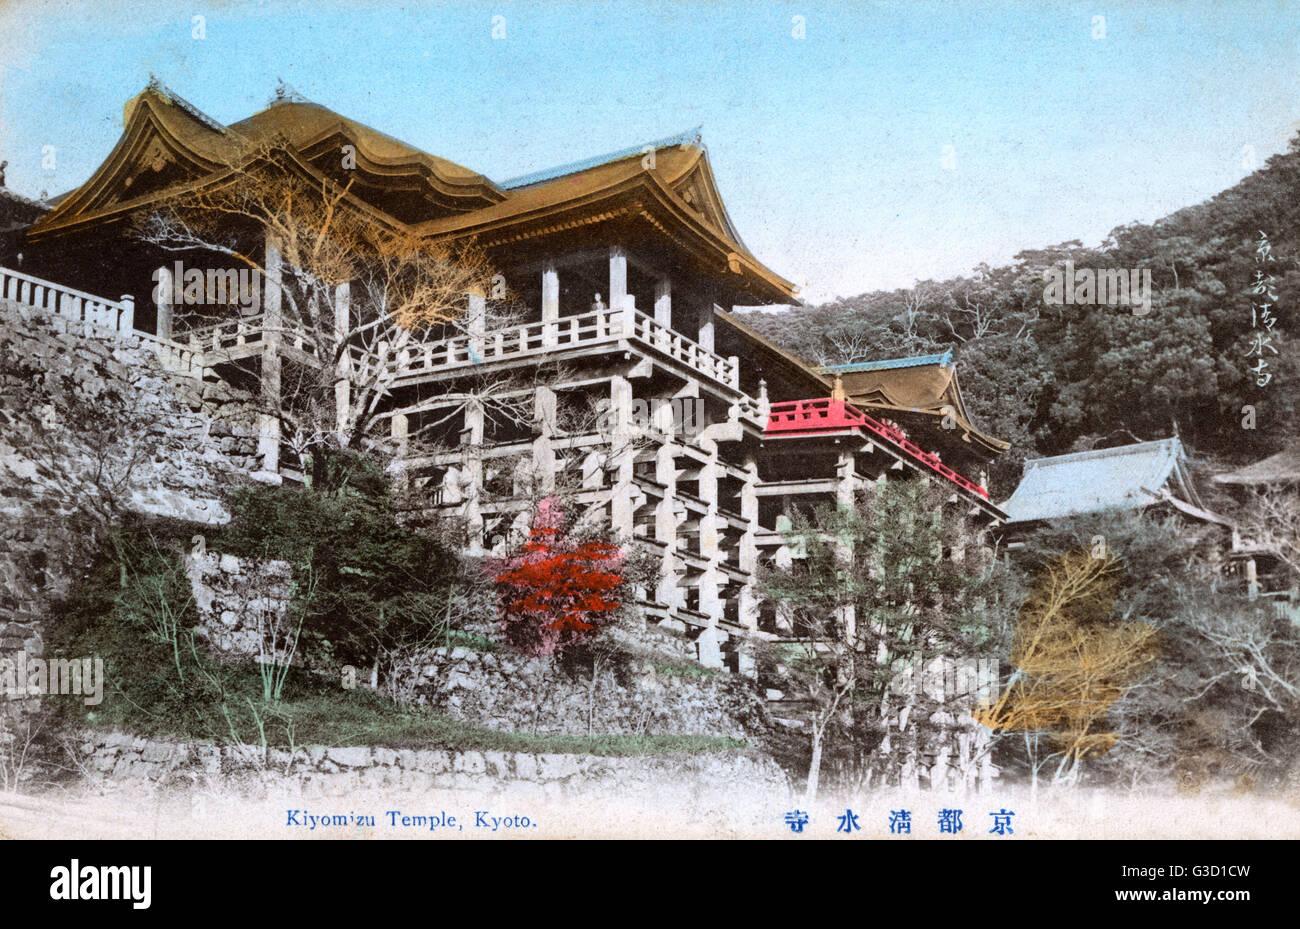 Kiyomizu dera, officially Otowa-san Kiyomizu-dera - an independent Buddhist temple in eastern Kyoto.     Date: circa - Stock Image